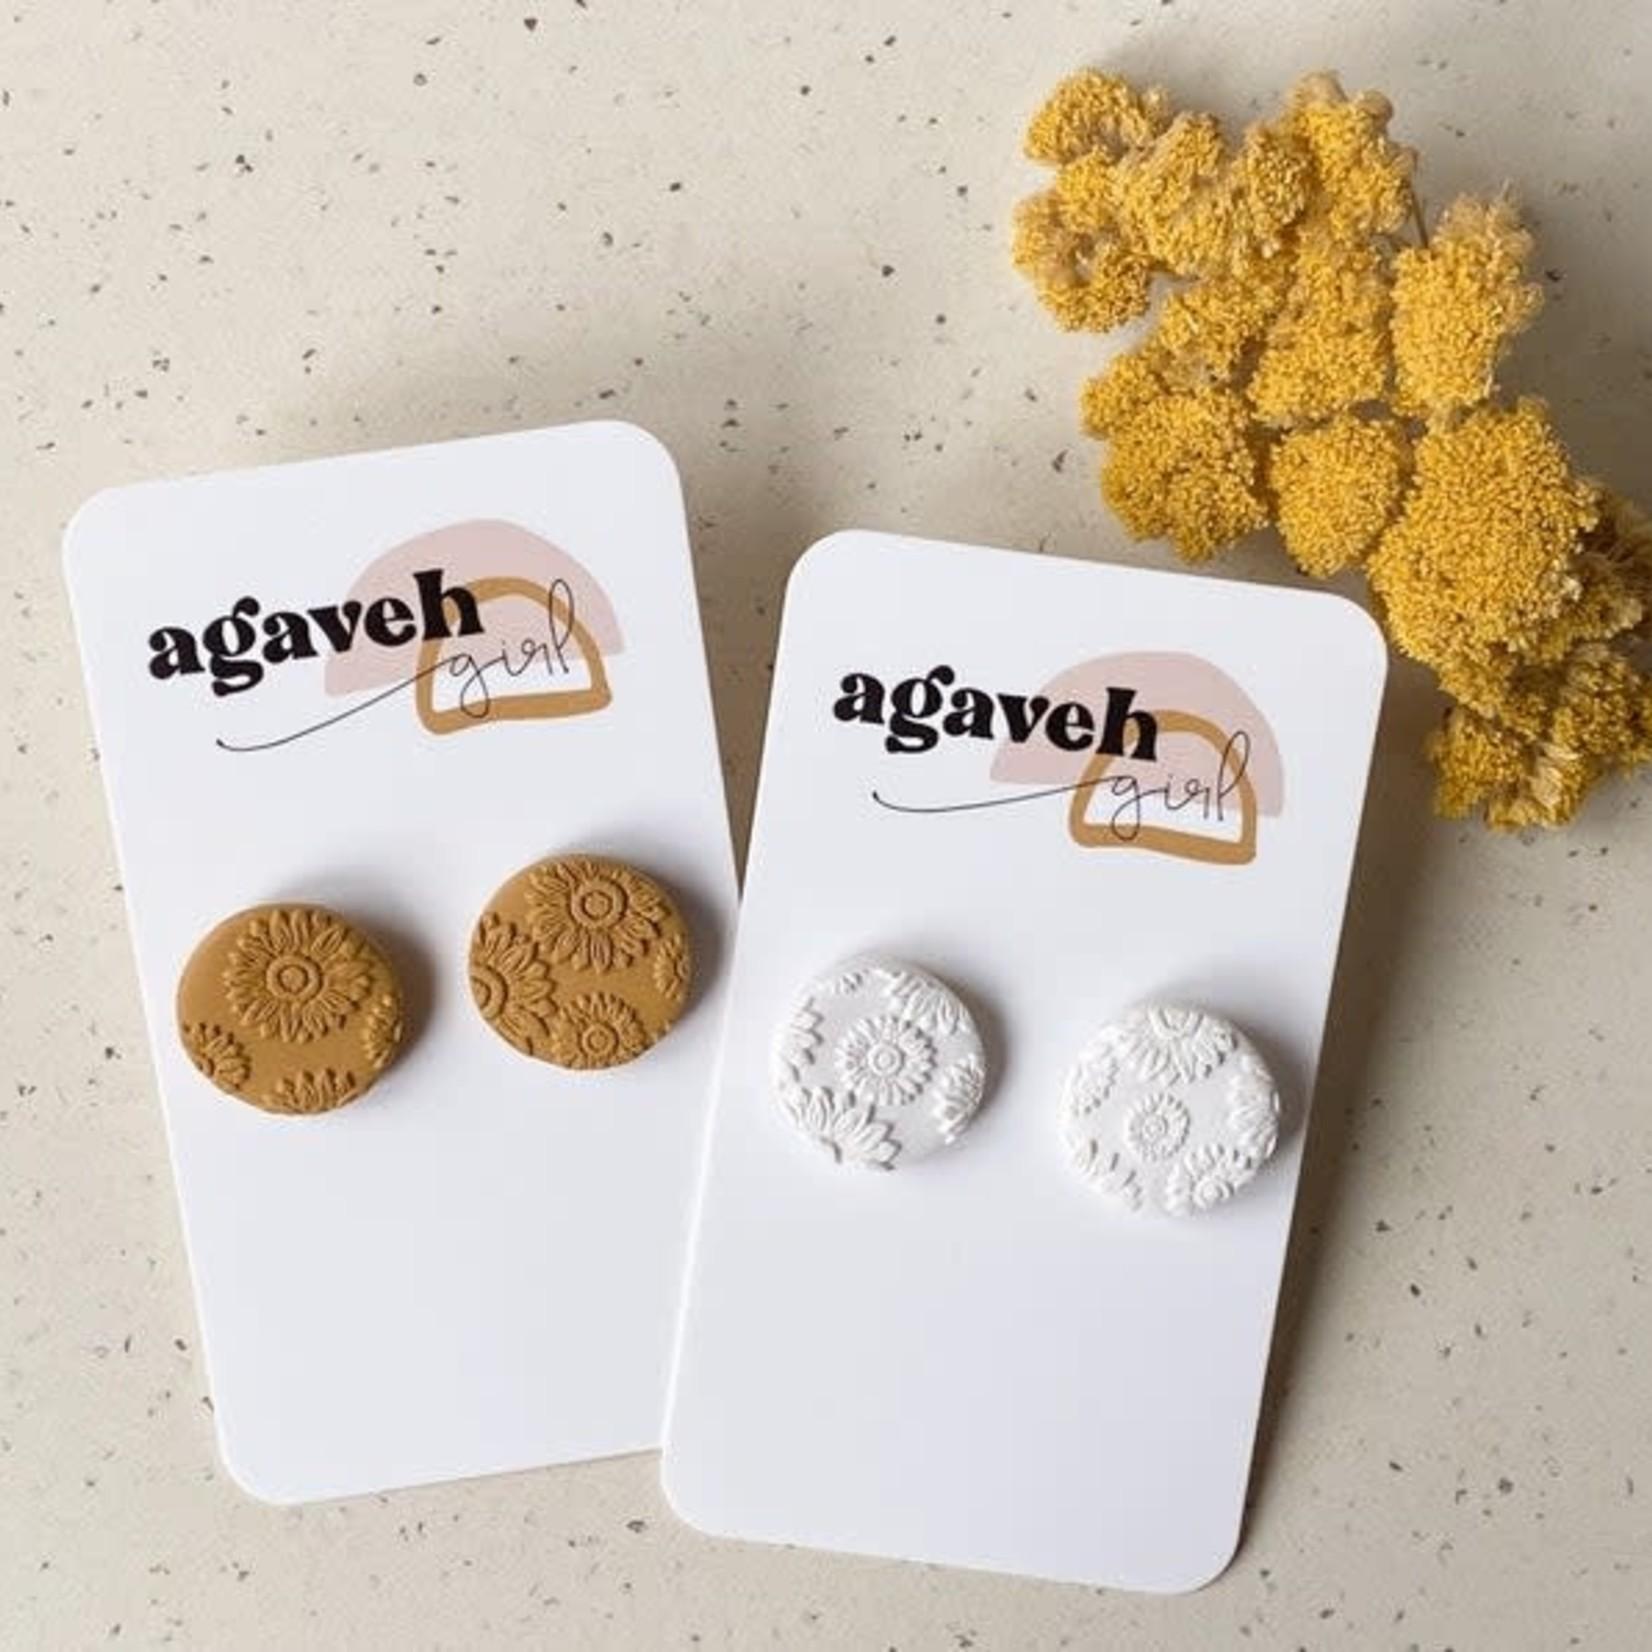 agaveh girl Sunflower Studs